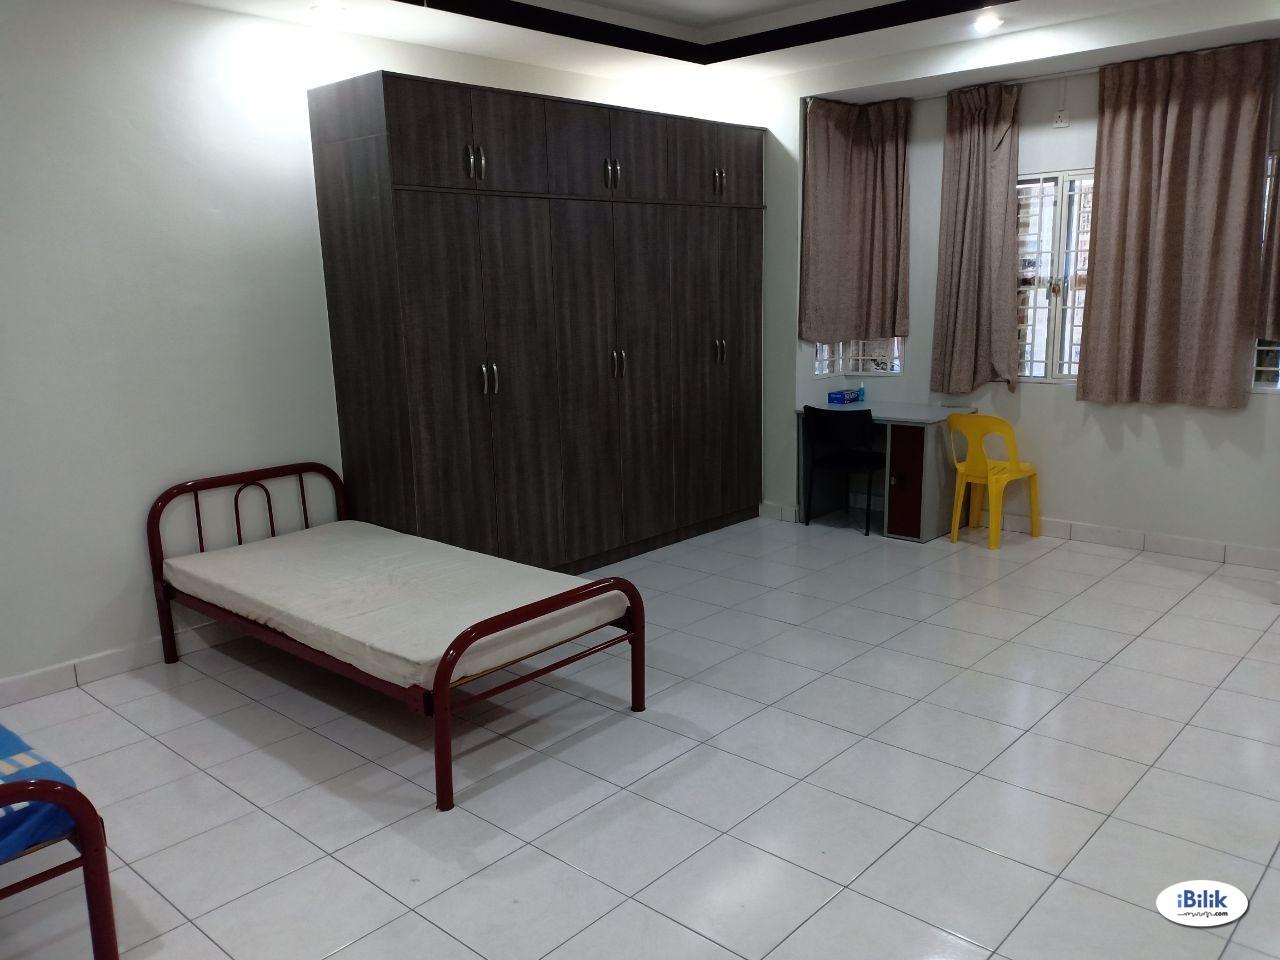 COZY Master Room at Dengkil,Putrajaya,Cyberjaya Selangor